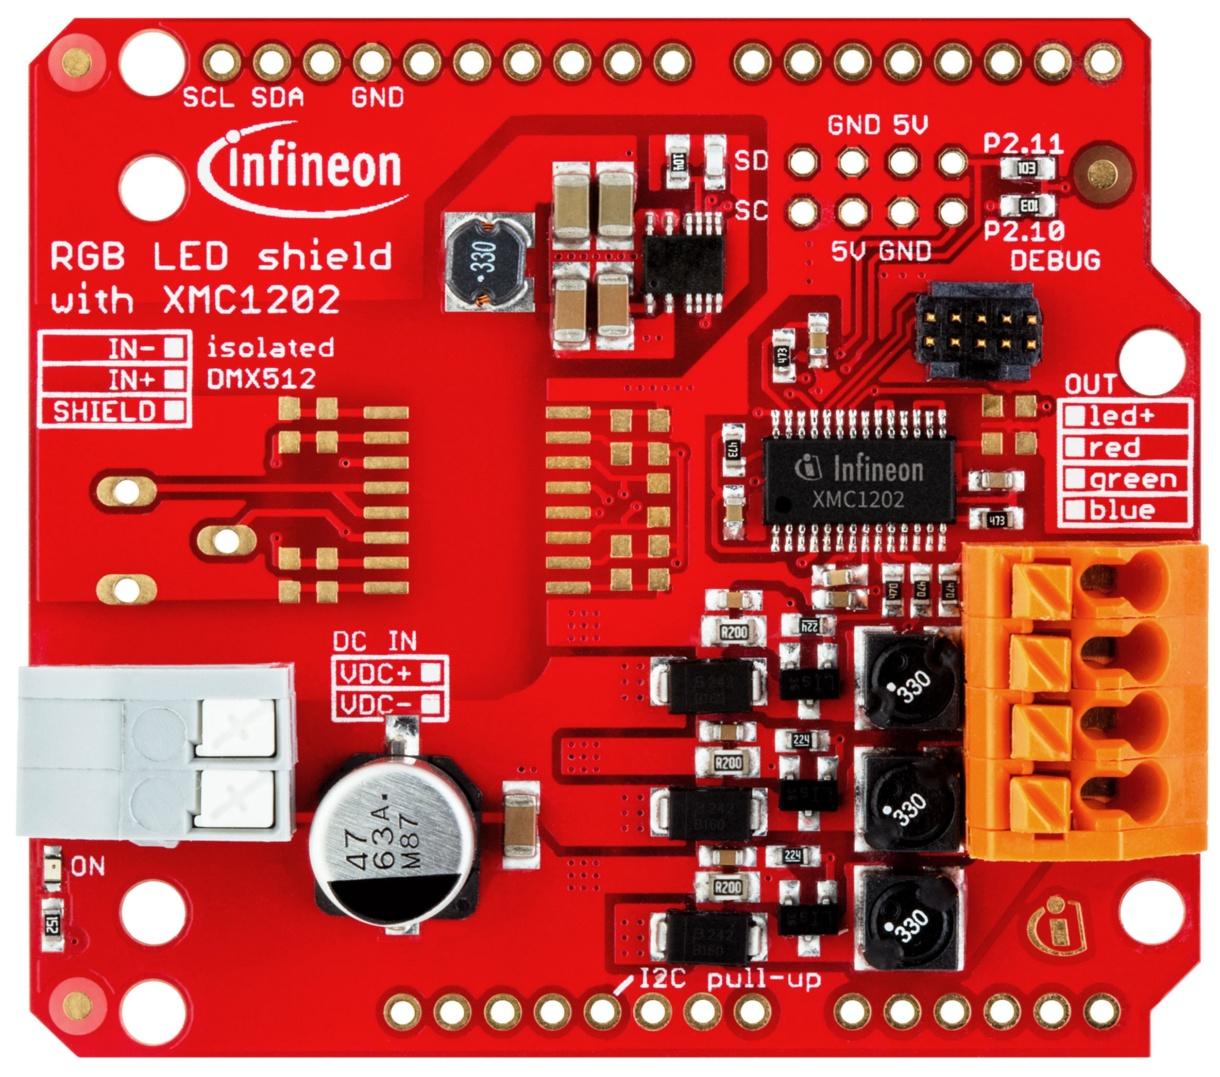 Infineon RGB LED Lighting Shield with XMC1202